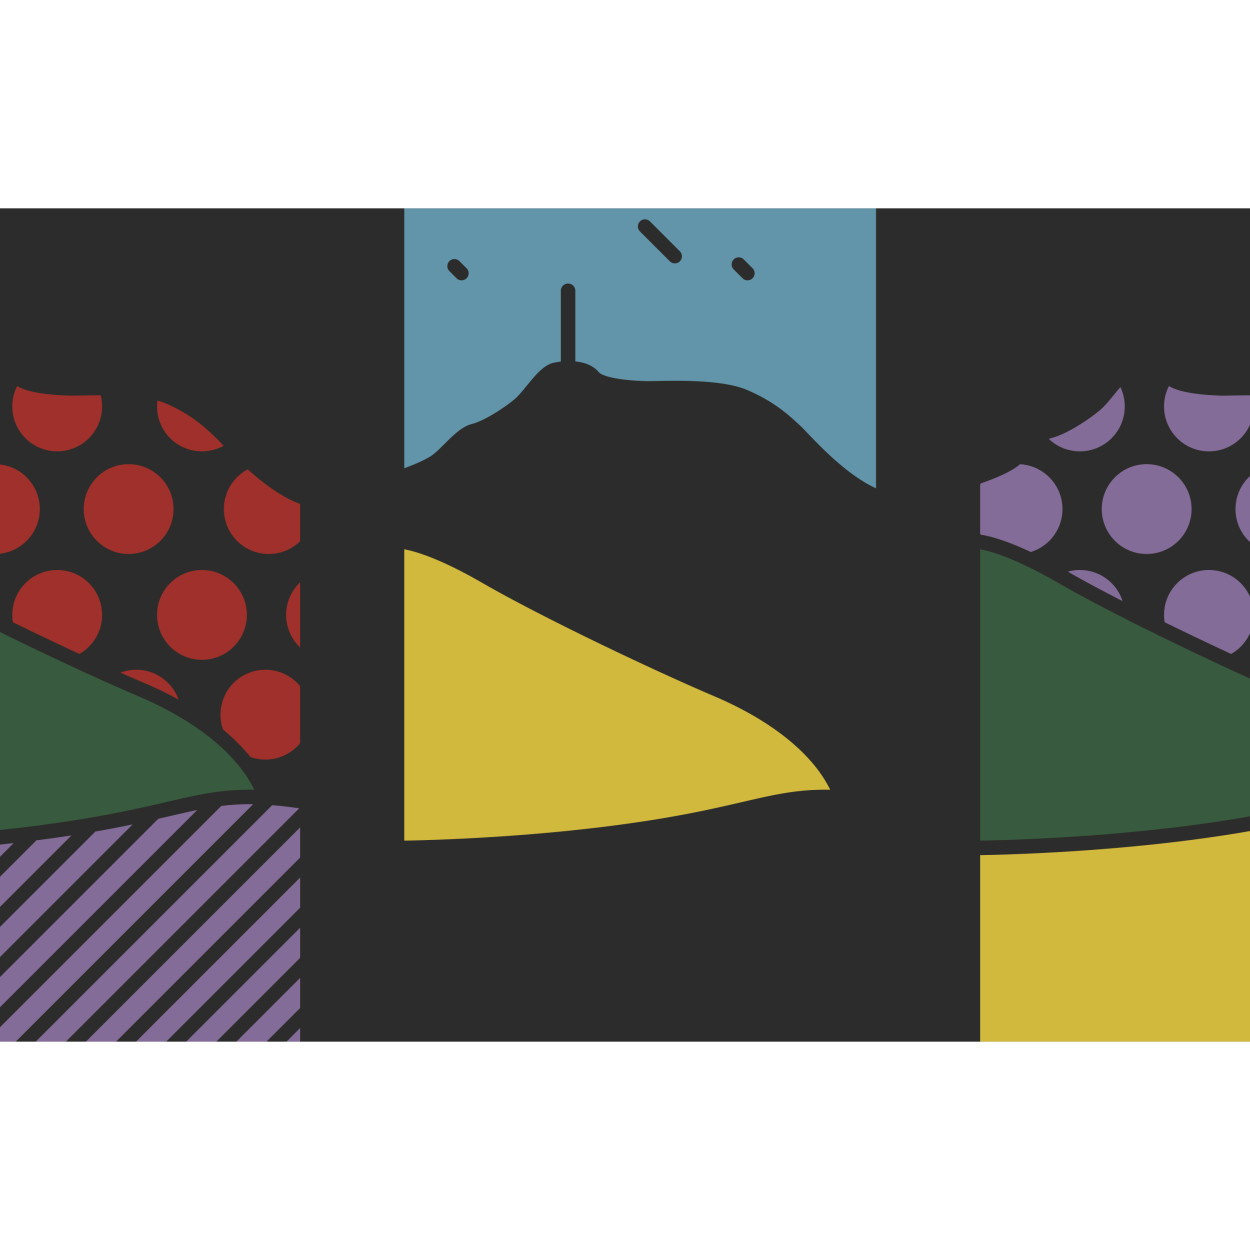 JULIEN-VICTOIRE-DOME-COLORS-3X2-VARIANTES-ZOOM.jpg